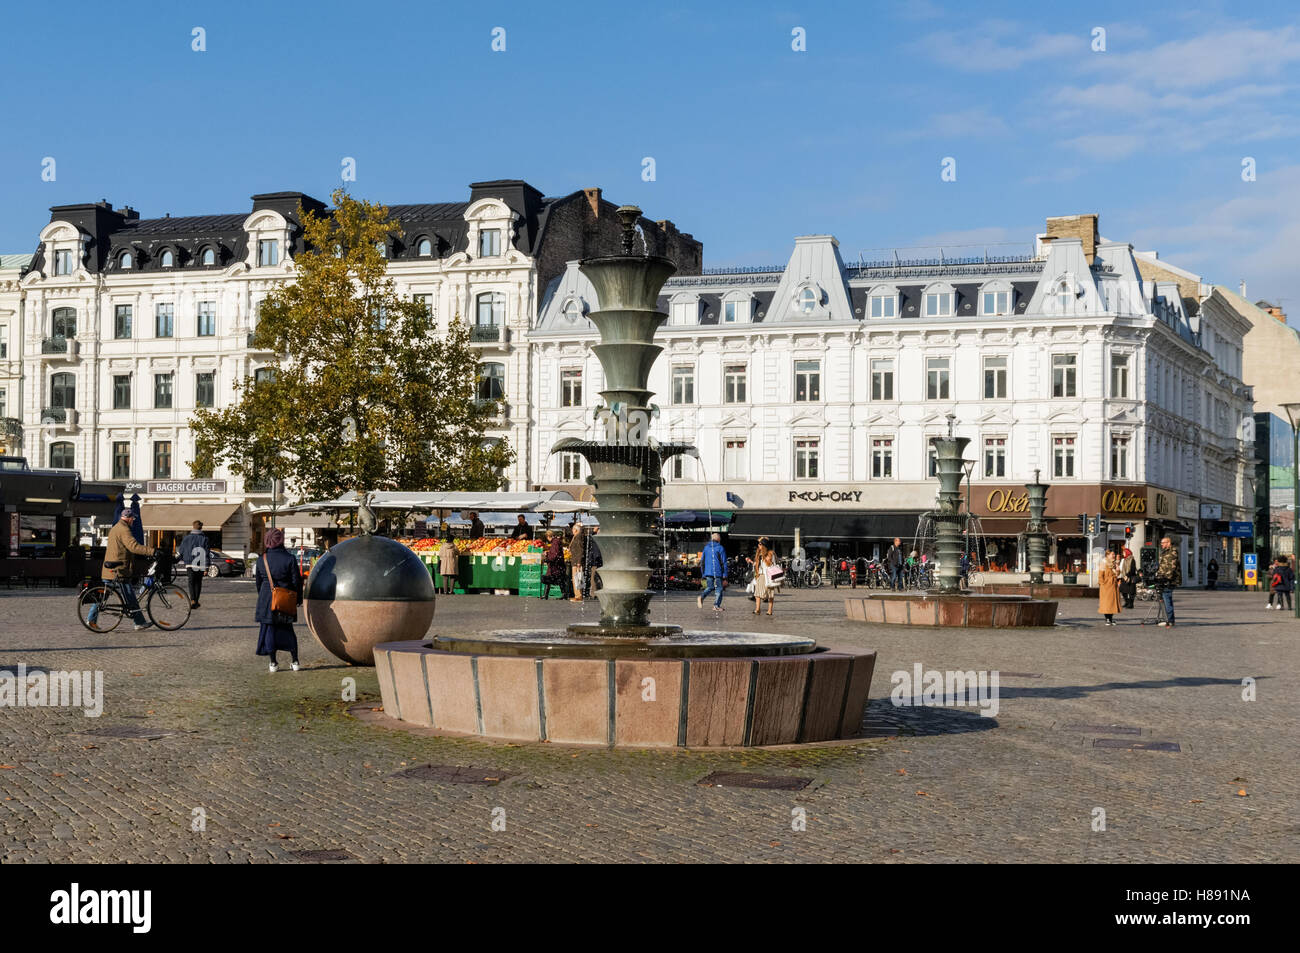 890d4b08a3f7 Gustav Adolf's Square (Gustav Adolfs torg) in Malmo, Sweden Stock ...